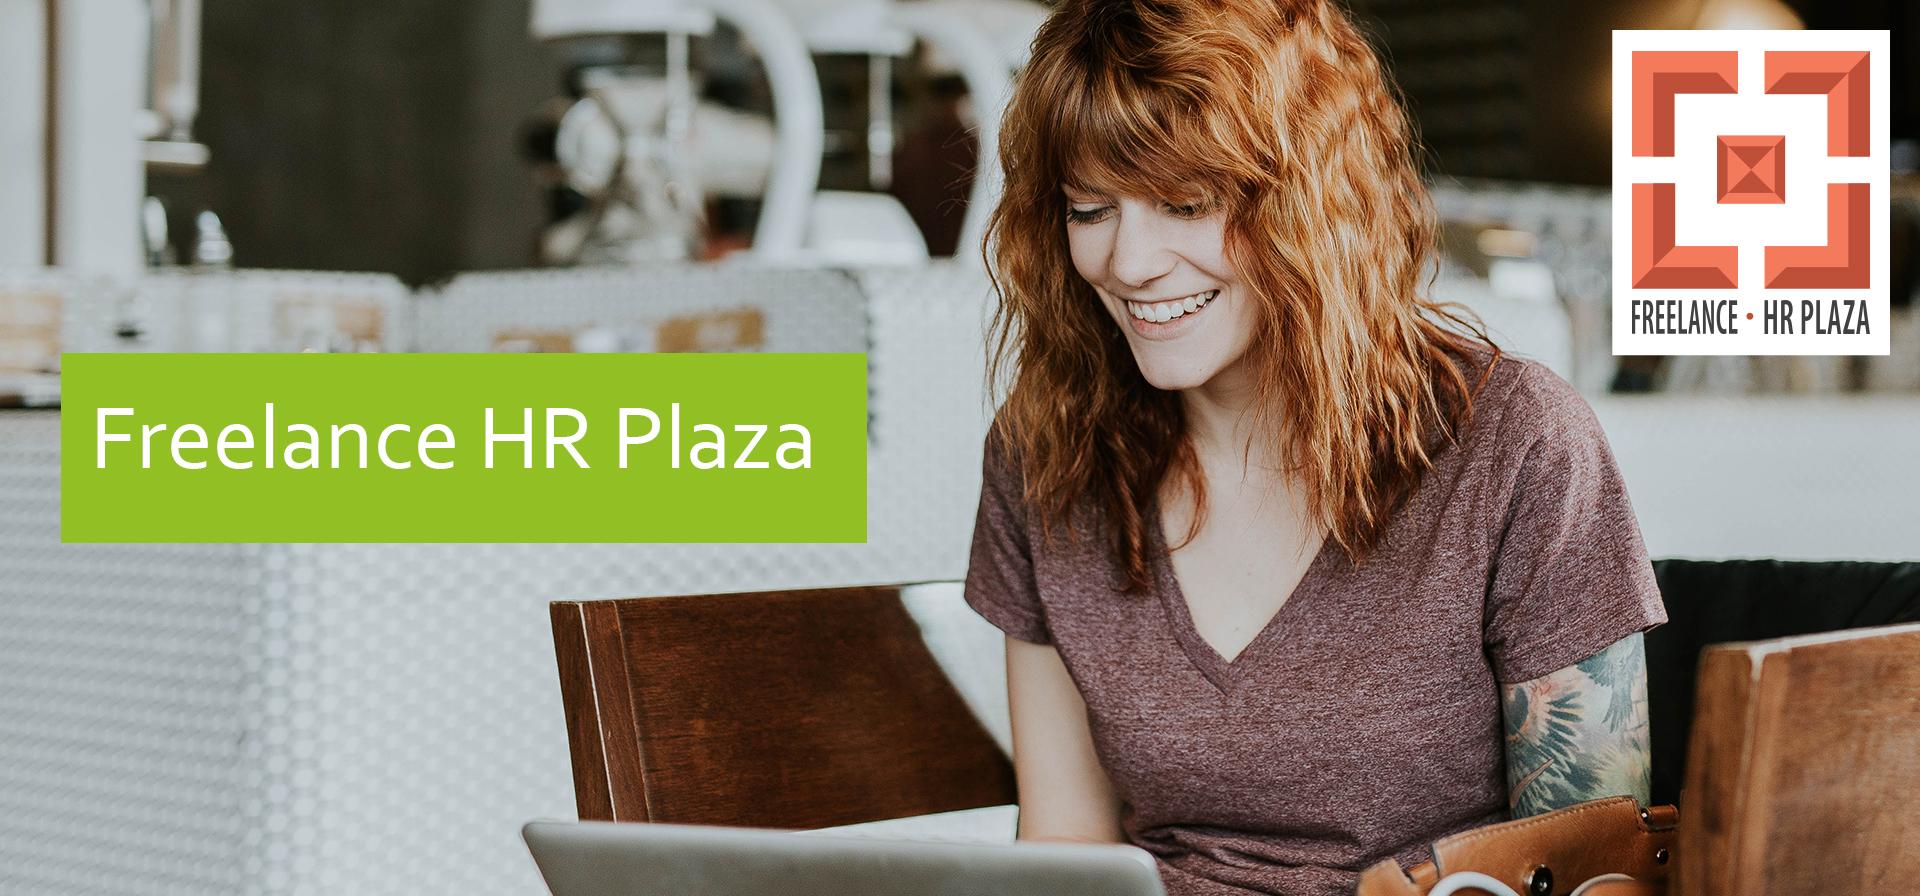 Freelance HR Plaza.jpg